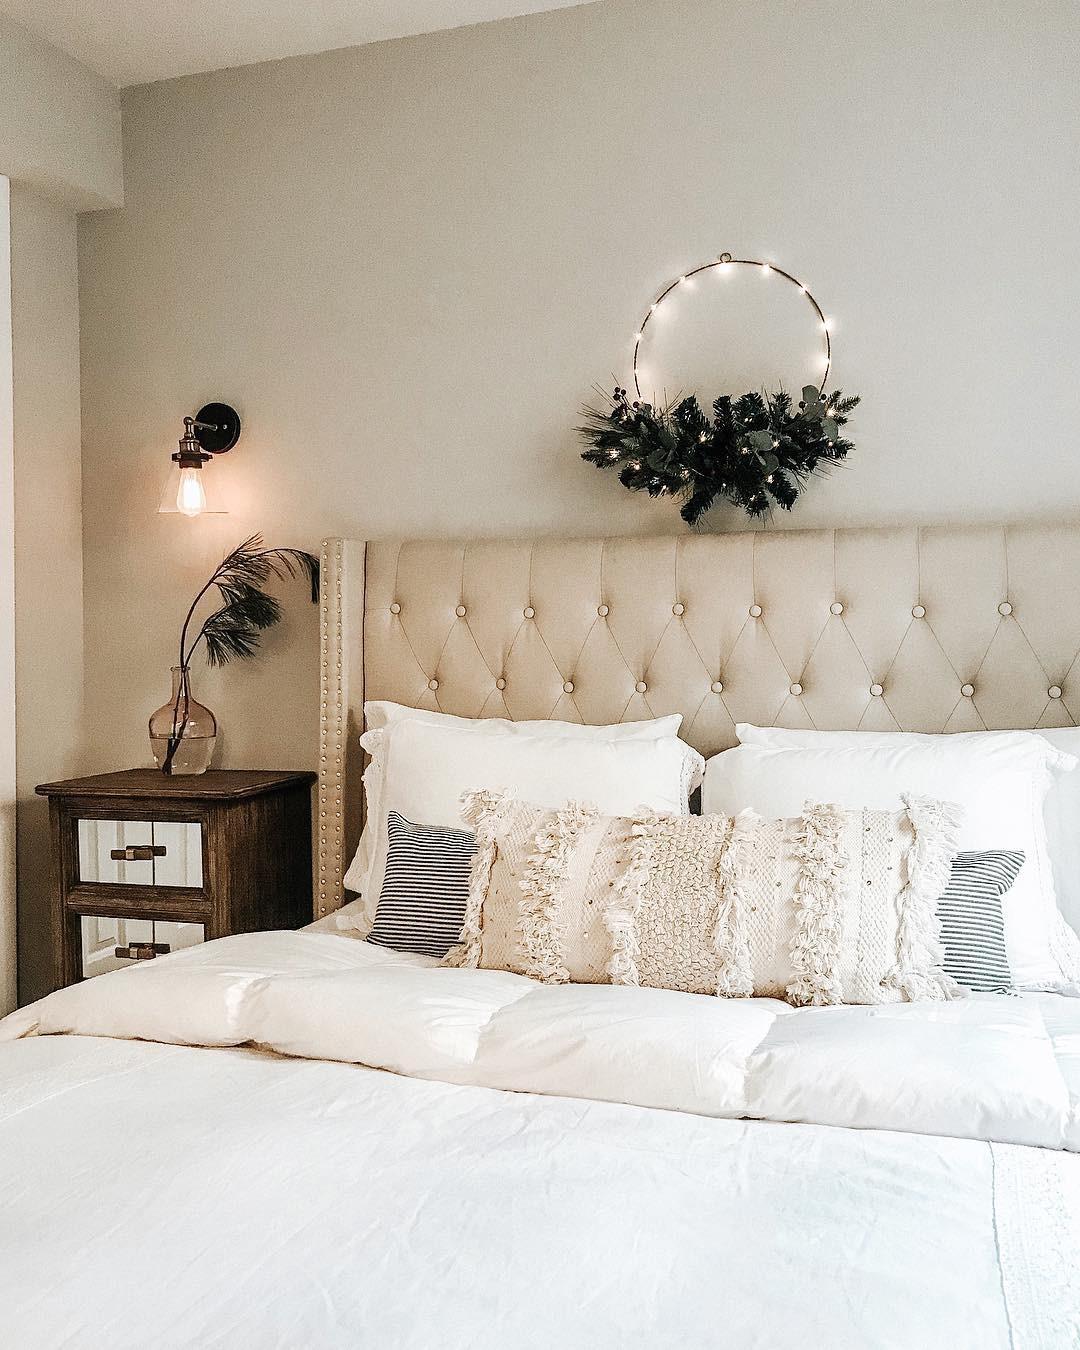 35 Inspiring Christmas Bedroom Decorating Ideas